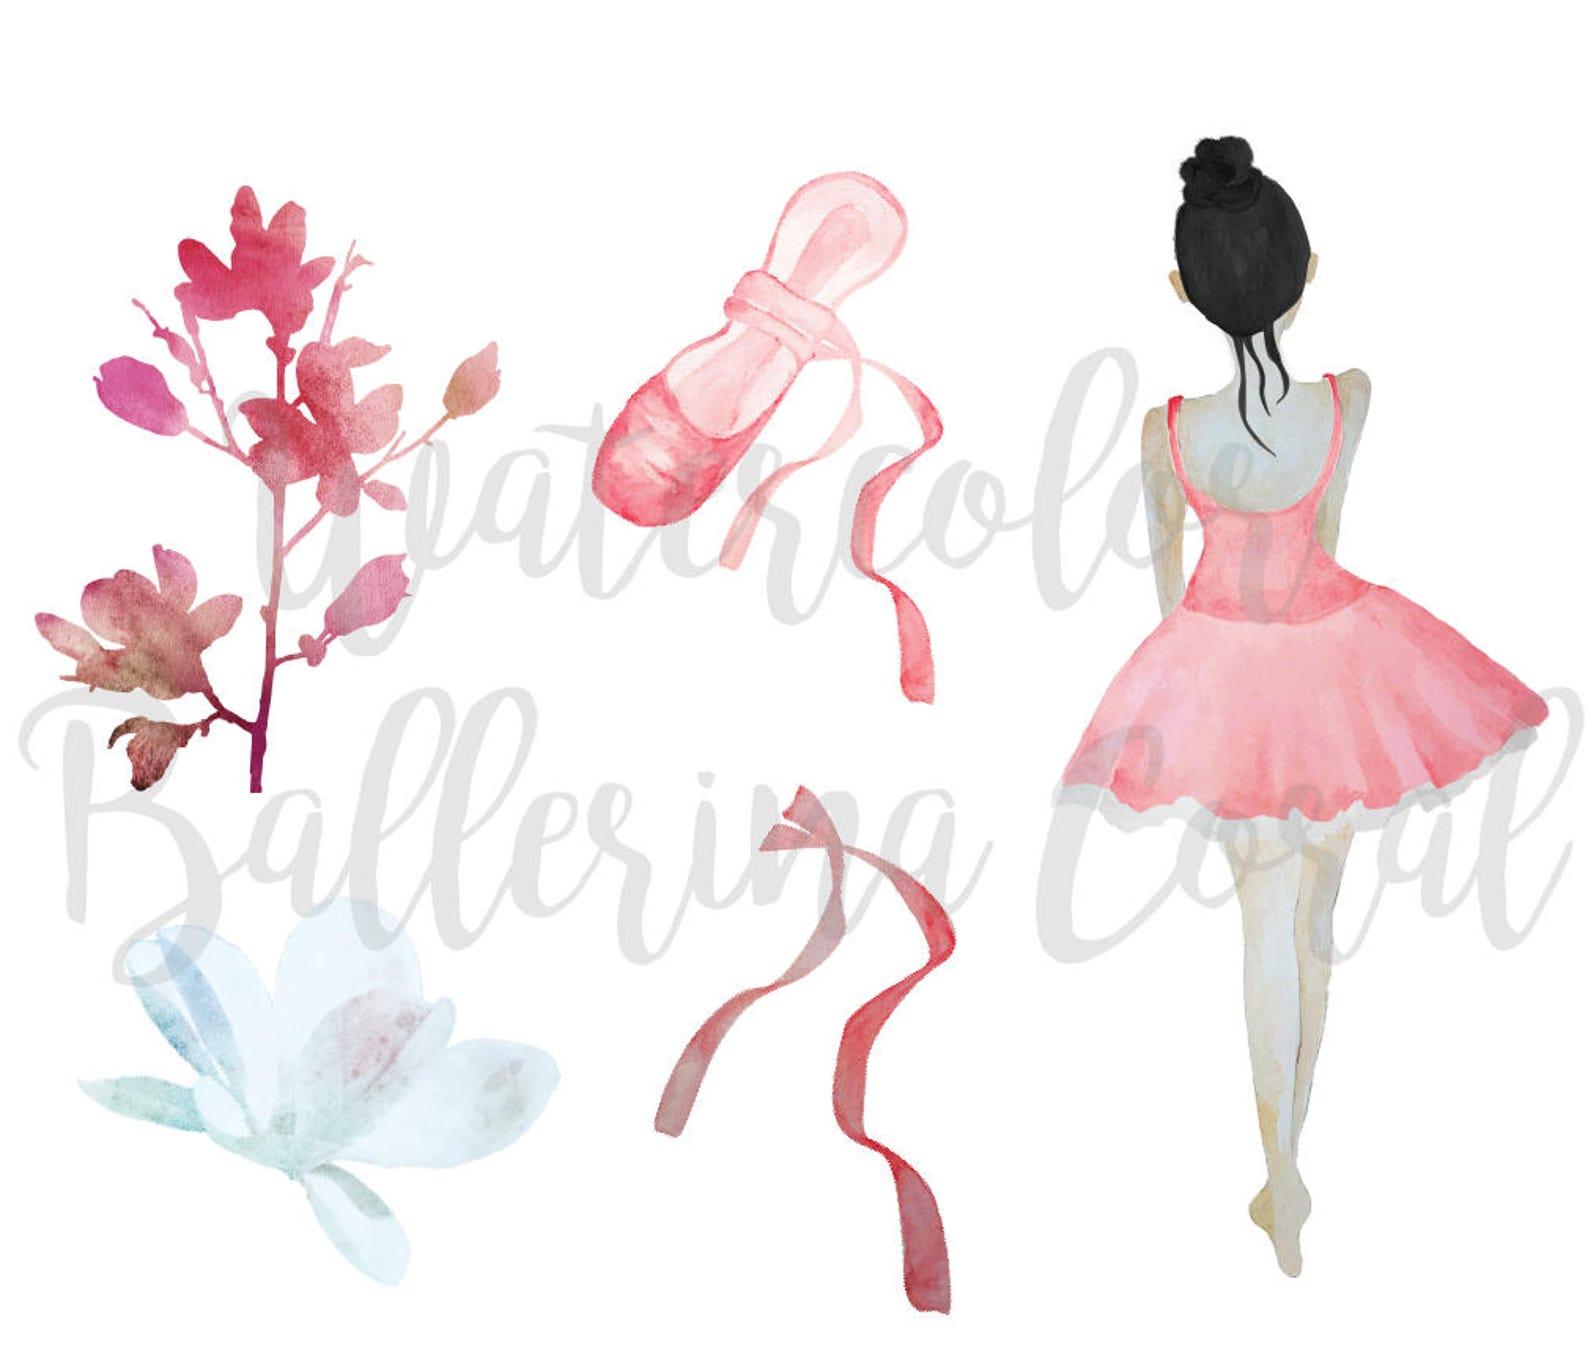 watercolor ballerina clip art, coral ballerina, tutu, ballet shoes, bow ballerina ribbons printable, stickers, collage, birthday